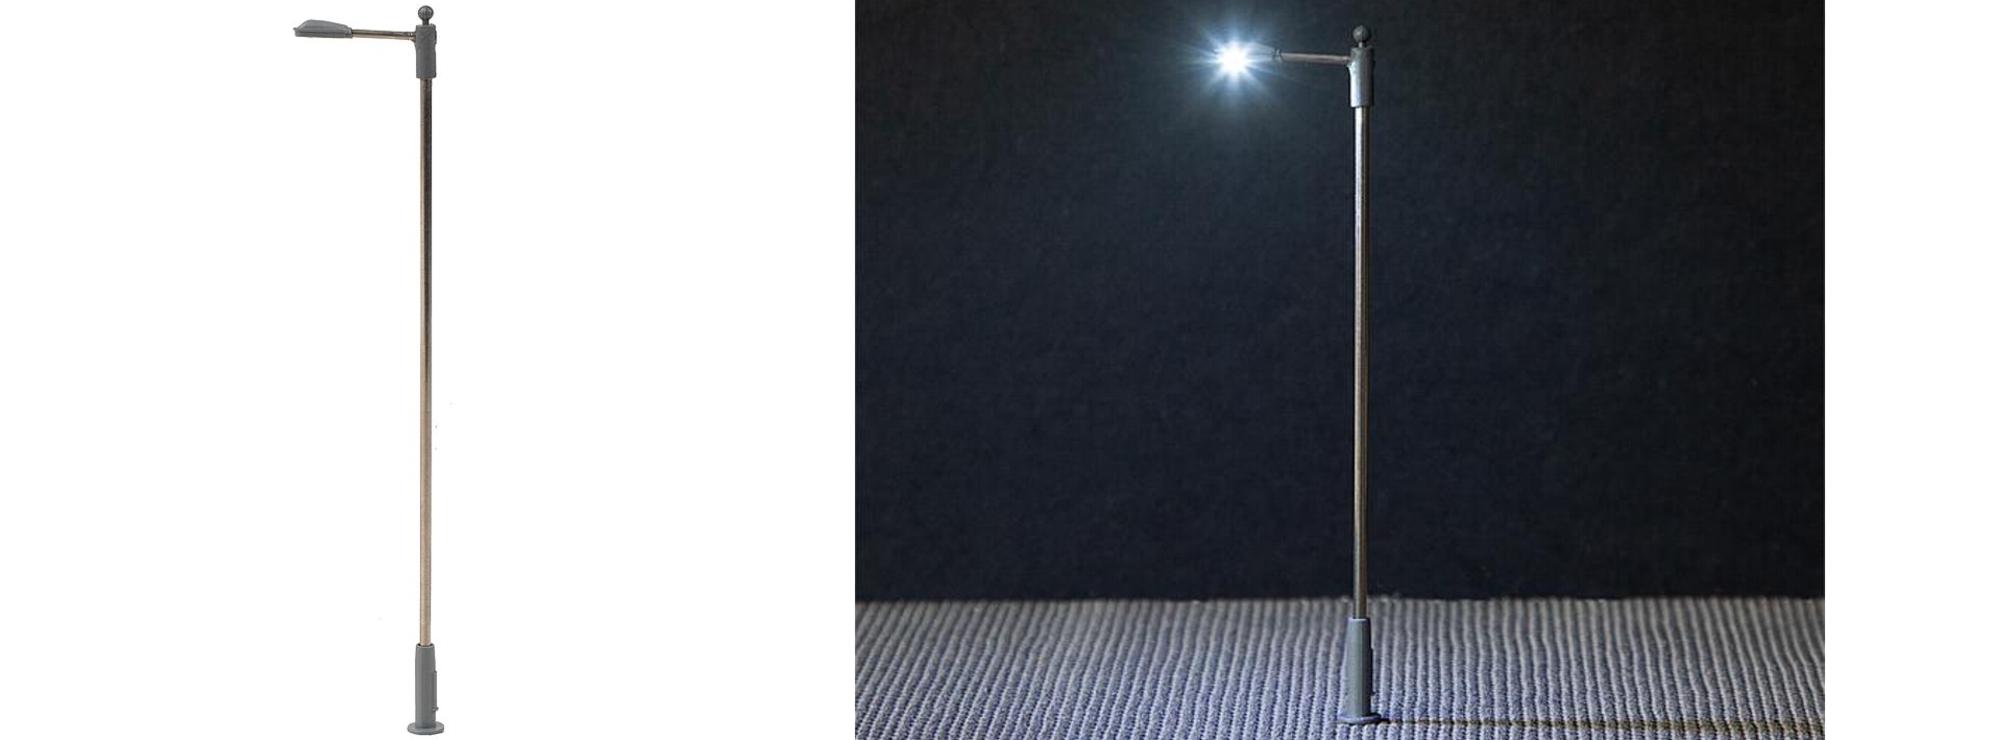 Faller LED Straßenbeleuchtung Ansatzleuchte Faller 180202   .